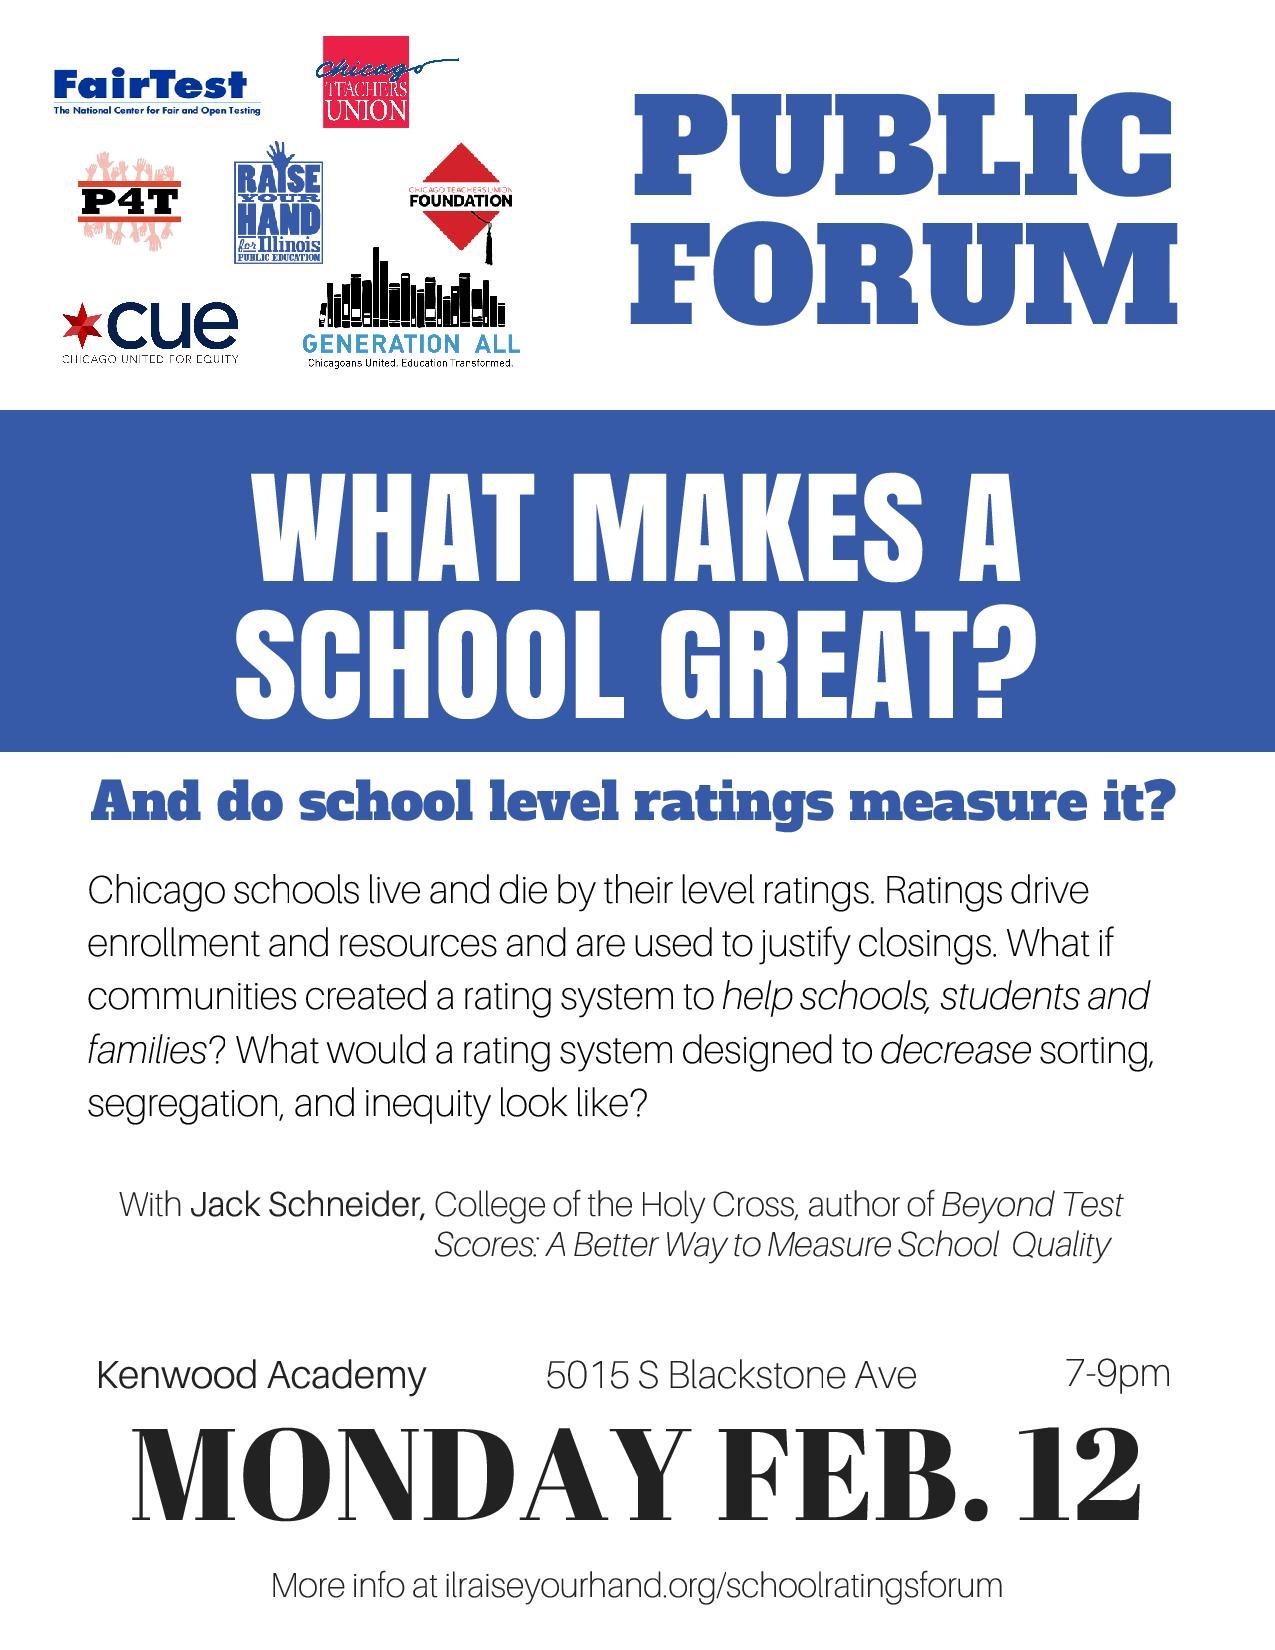 School_Ratings_Public_Forum_(3)-page-001.jpg